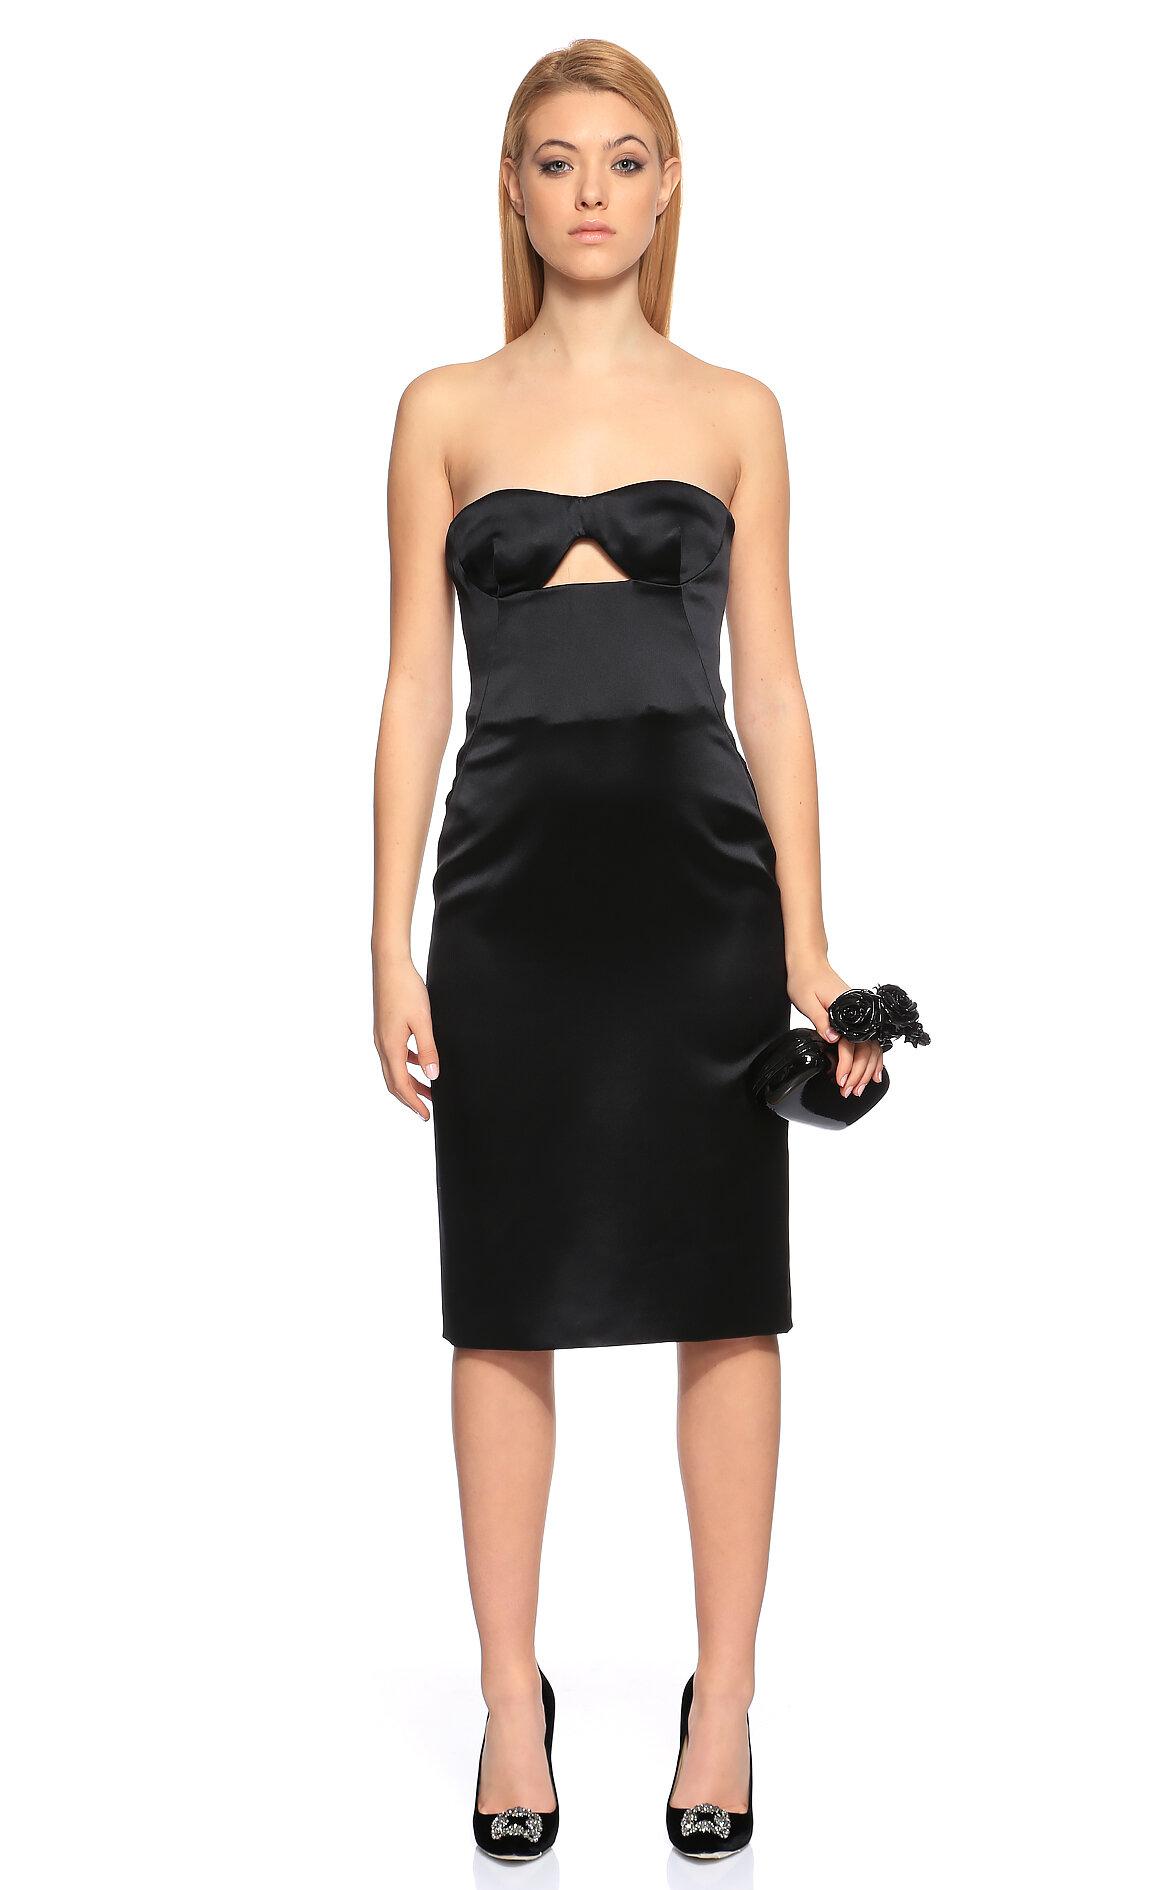 Alexander McQueen-Alexander McQueen Straplez Siyah Elbise